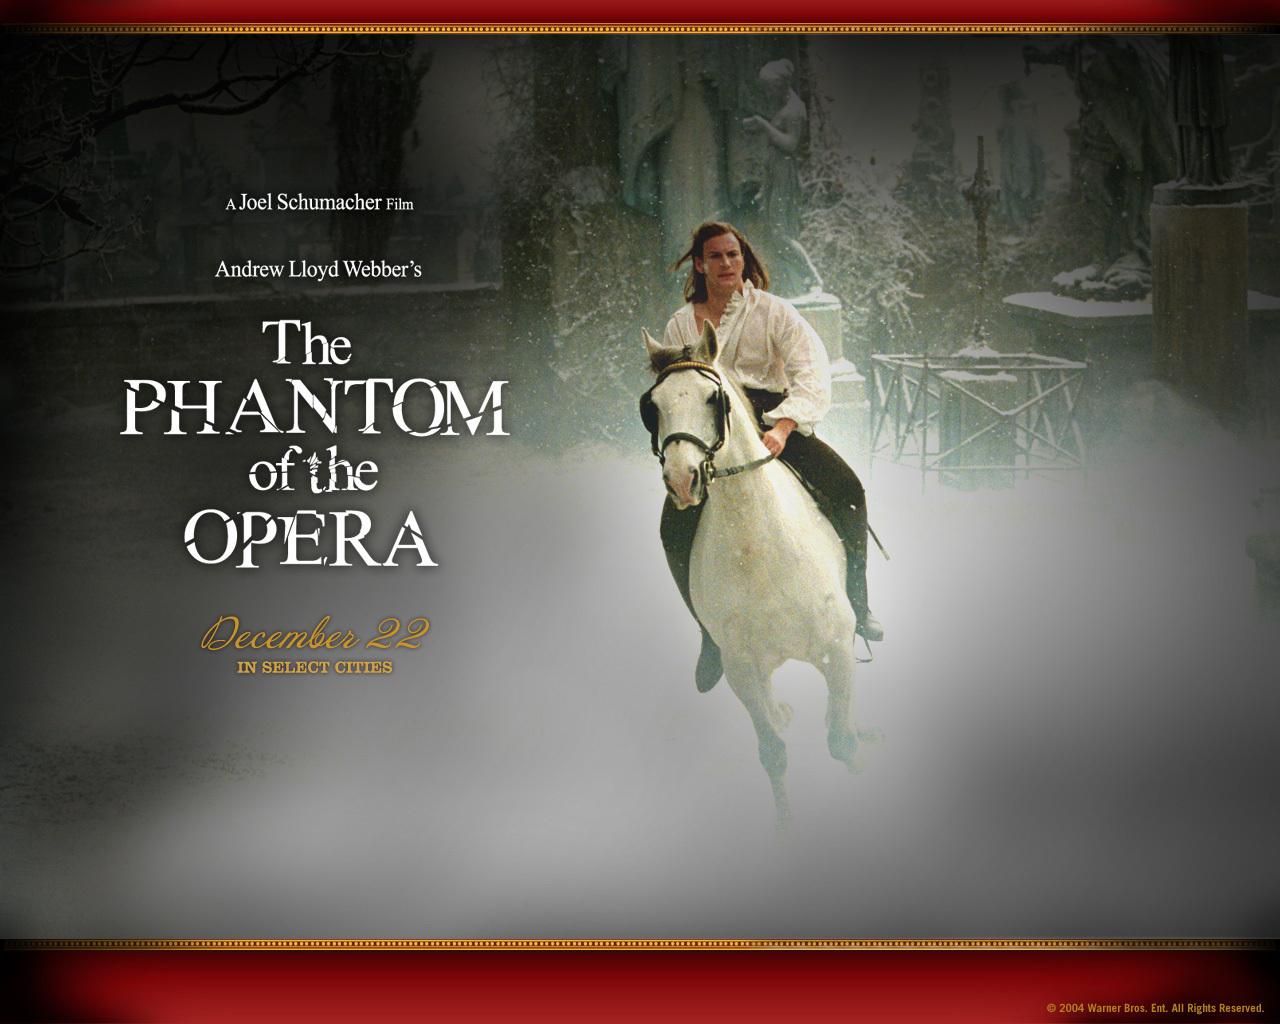 the phantom of the opera patrick wilson wallpaper 4133899 fanpop. Black Bedroom Furniture Sets. Home Design Ideas